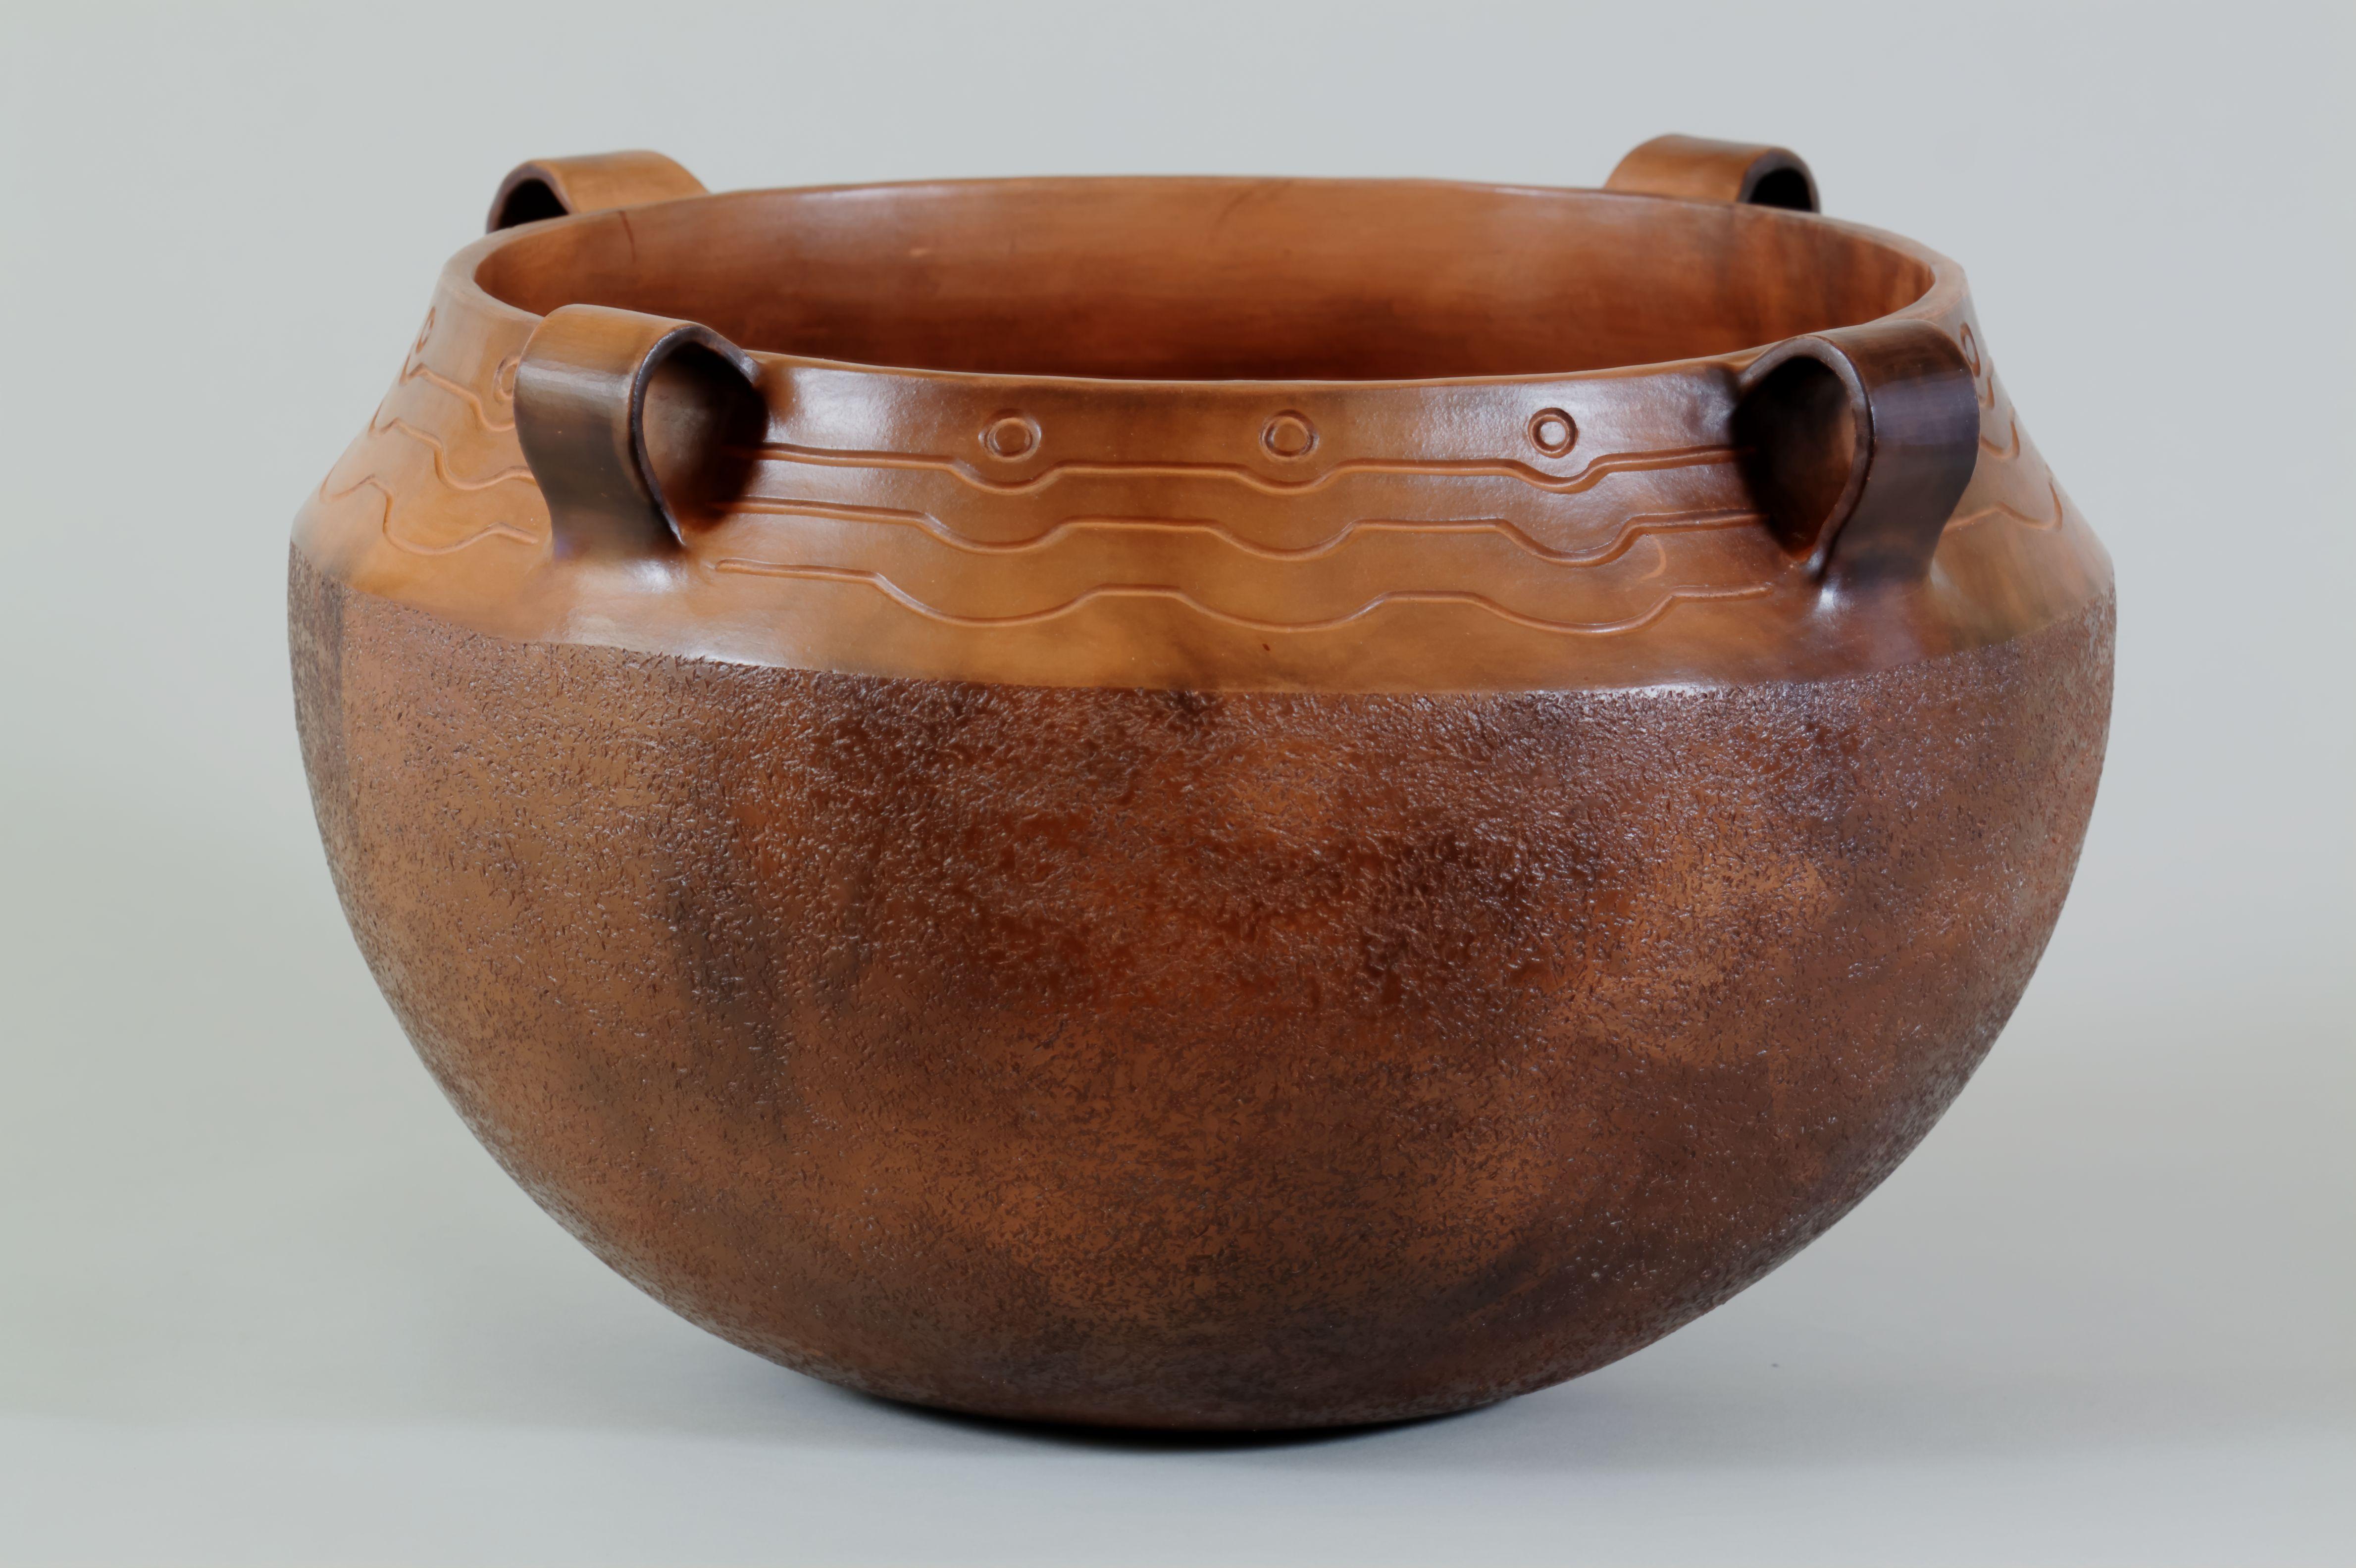 042-Four Handle Cook Pot